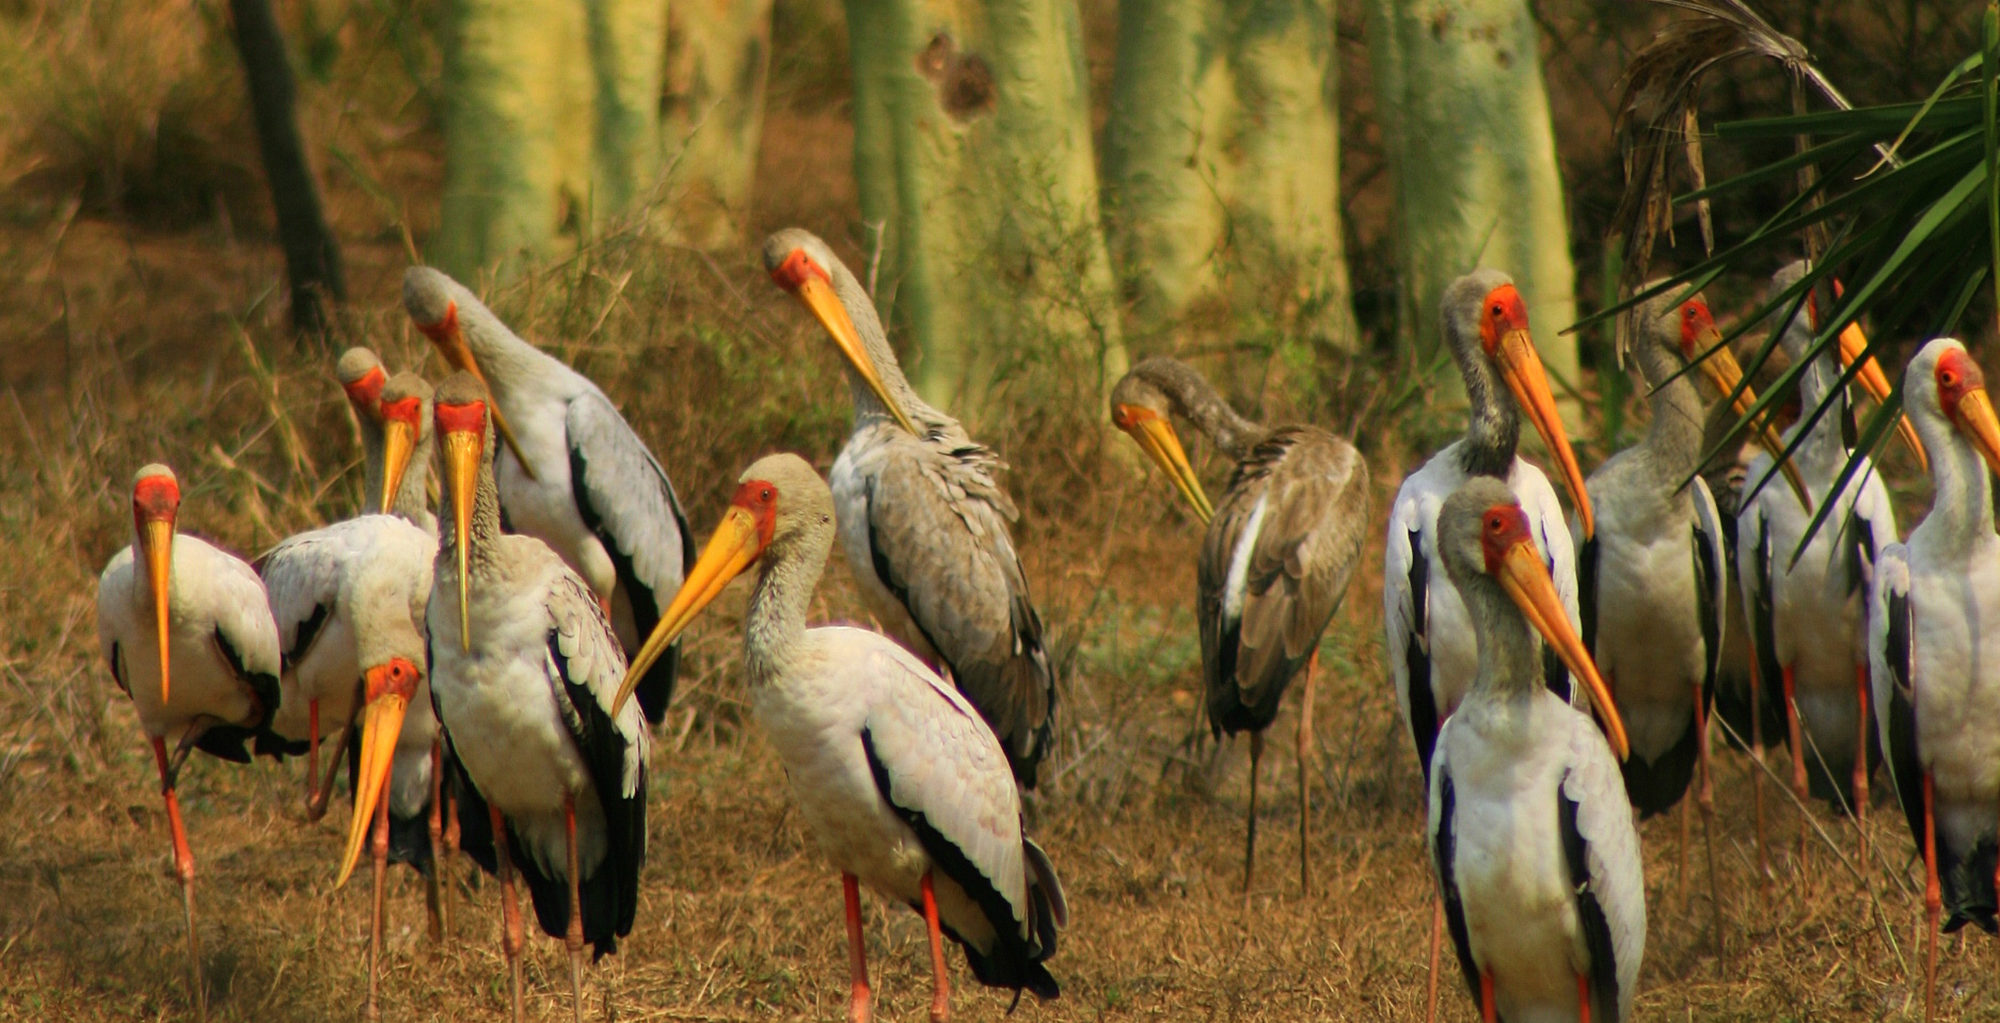 Mozambique-Gorongosa-National-Park-Explora-Gorongosa-Yellow-Billed-Stork